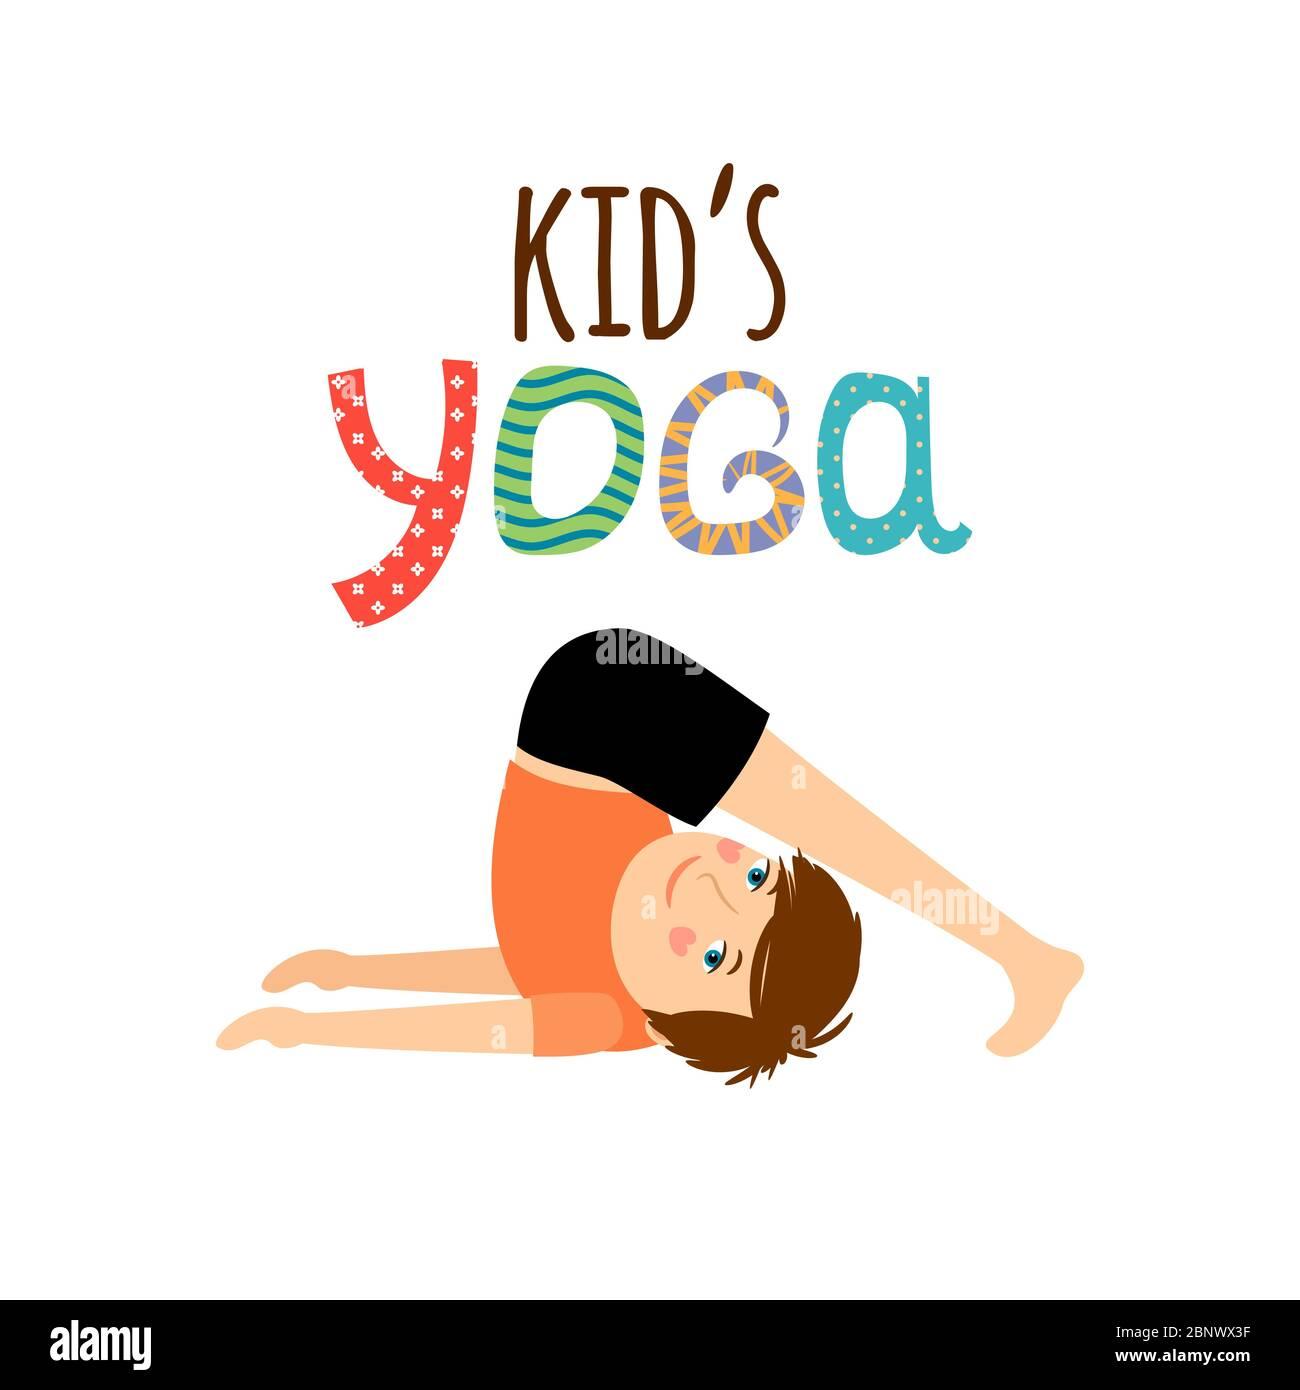 Yoga Kids Cartoon Logo Design With Boy Vector Illustration Stock Vector Image Art Alamy